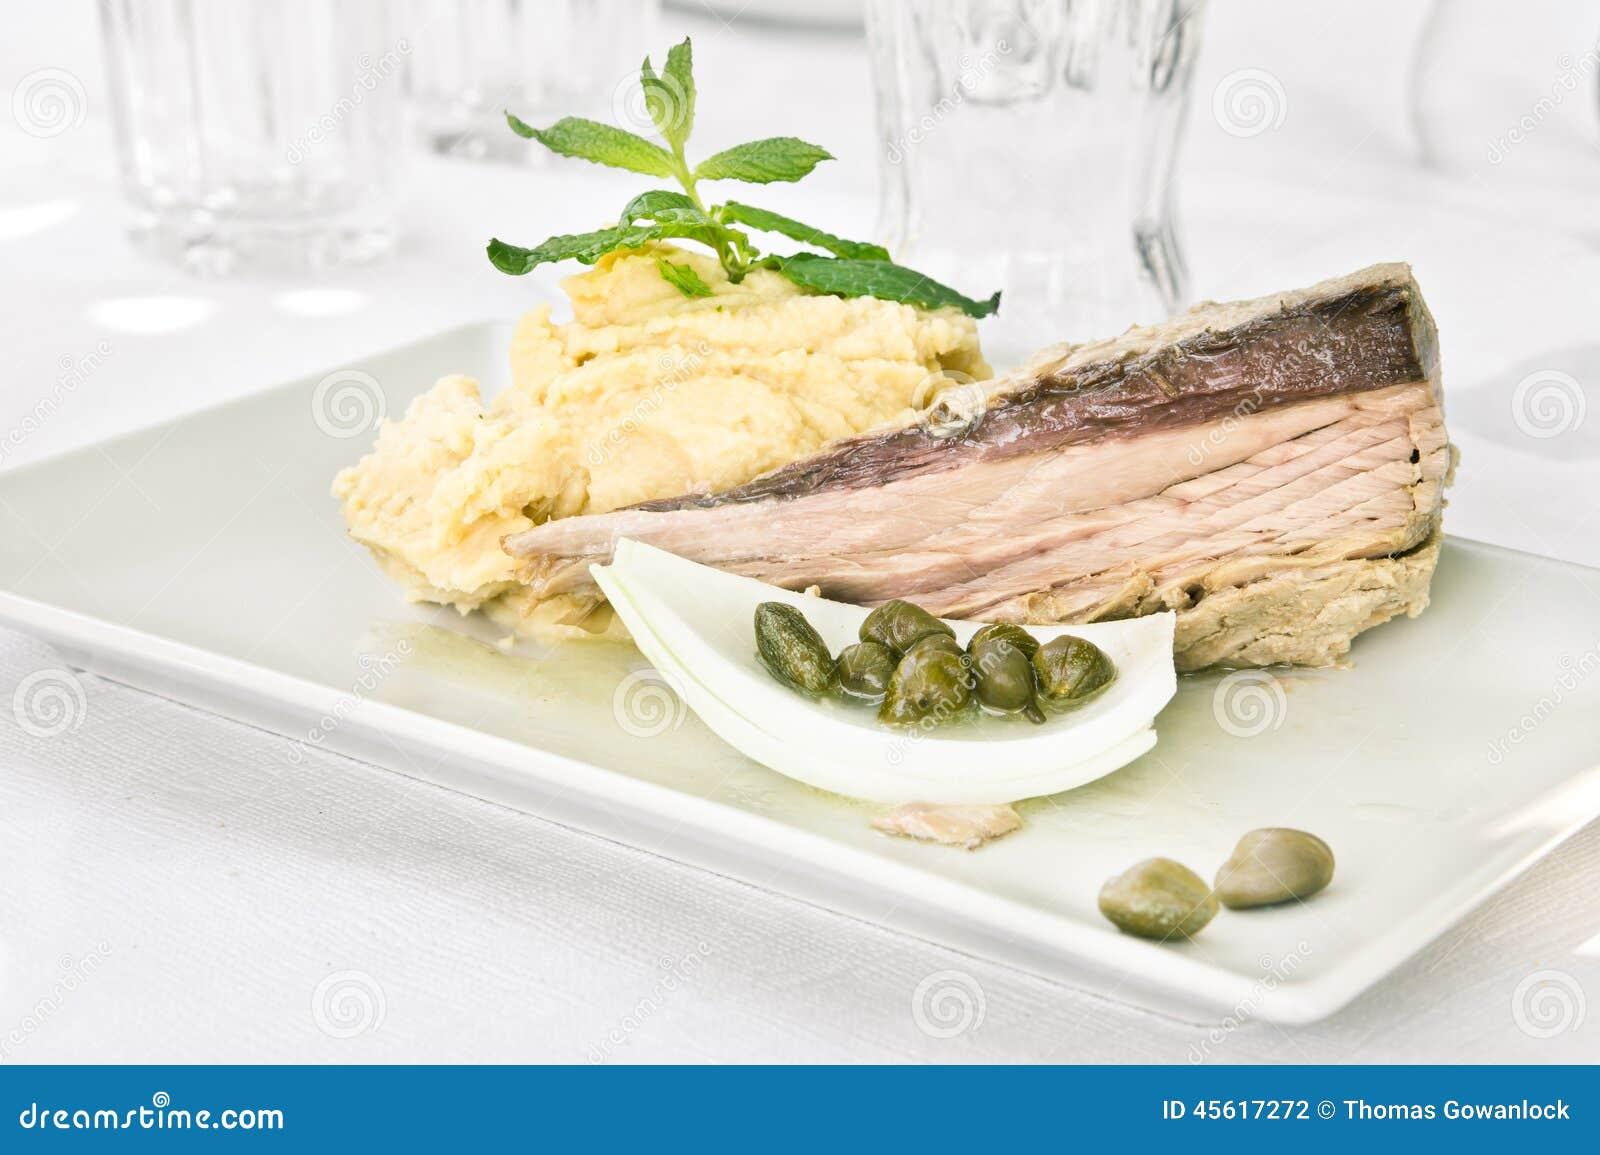 Tuna Caper Dip Recipes — Dishmaps